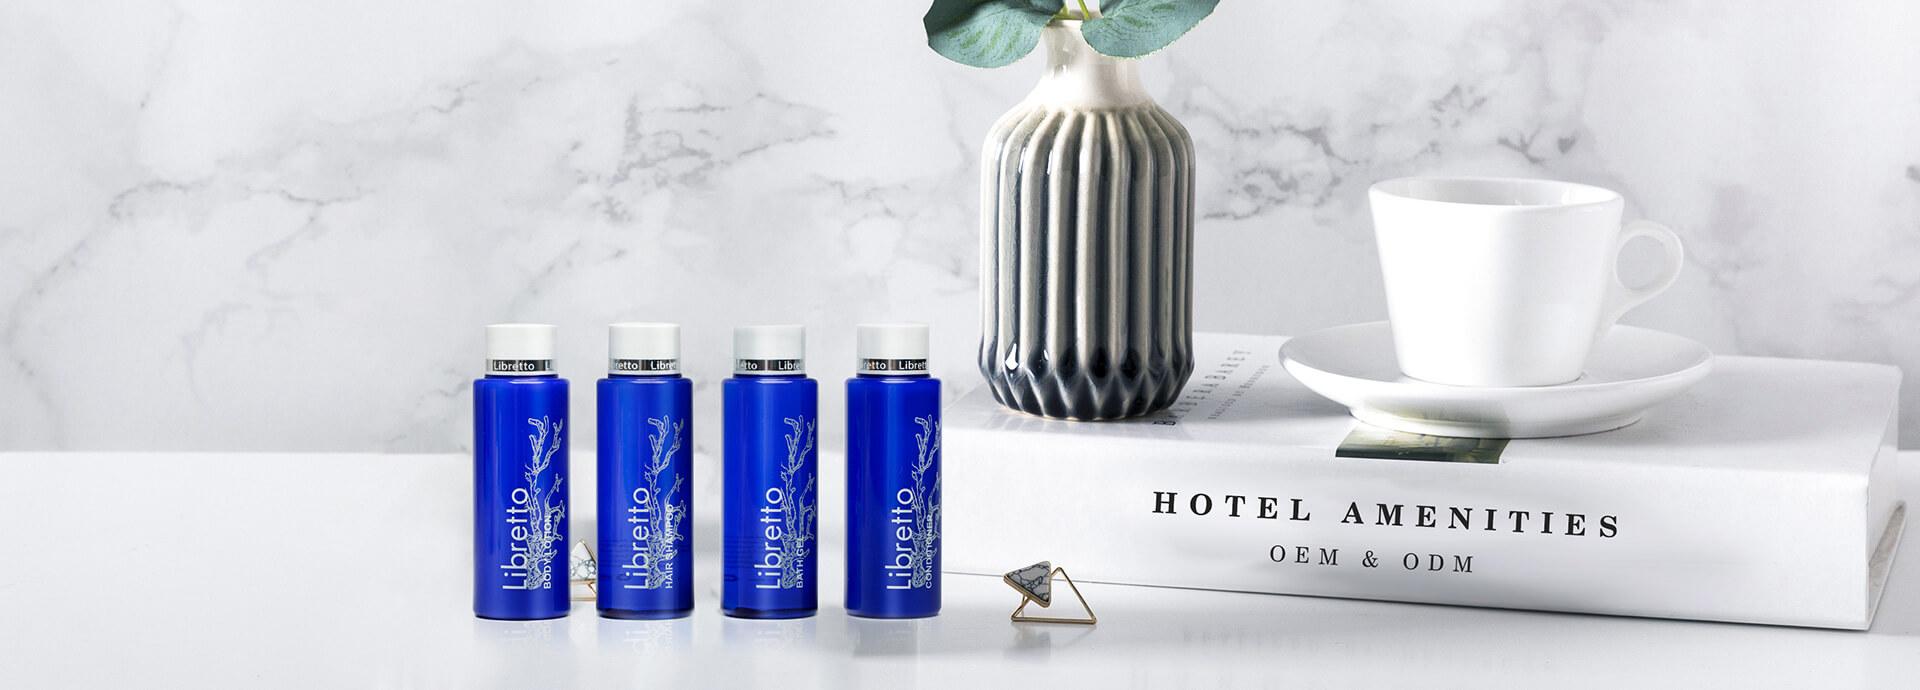 Hotel Amenities Sets